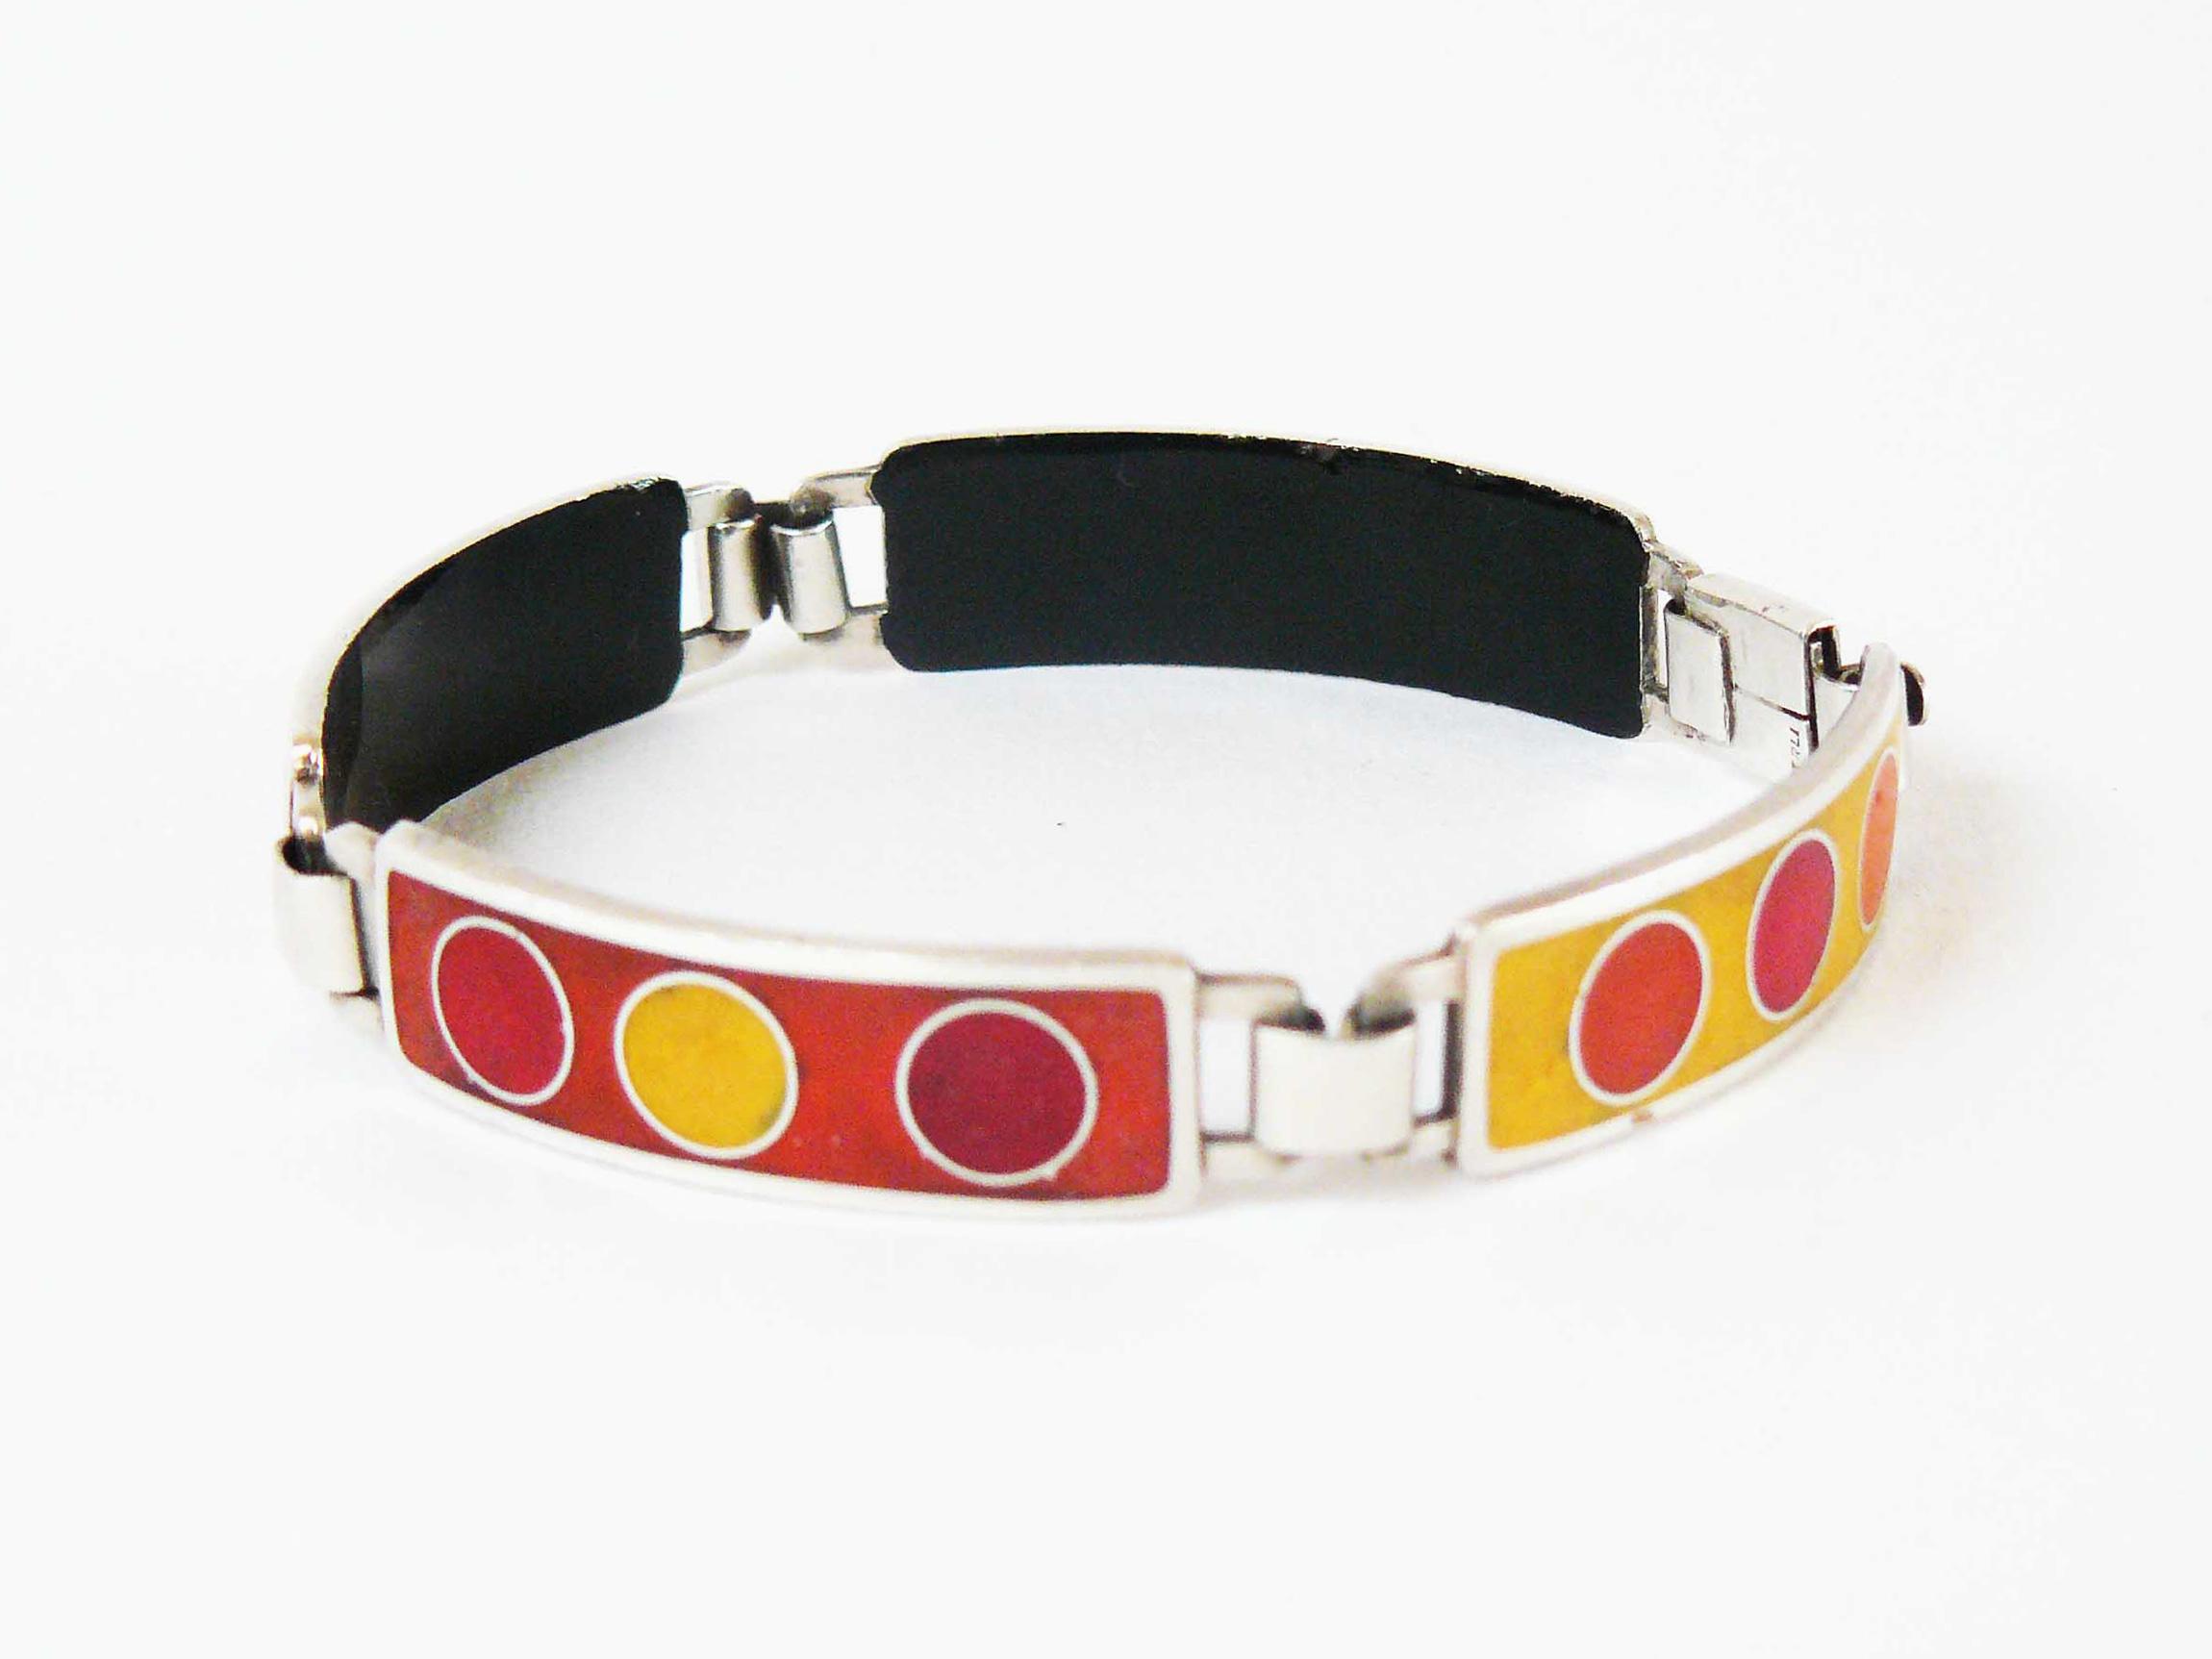 Bracelet, silver-plated, Perli